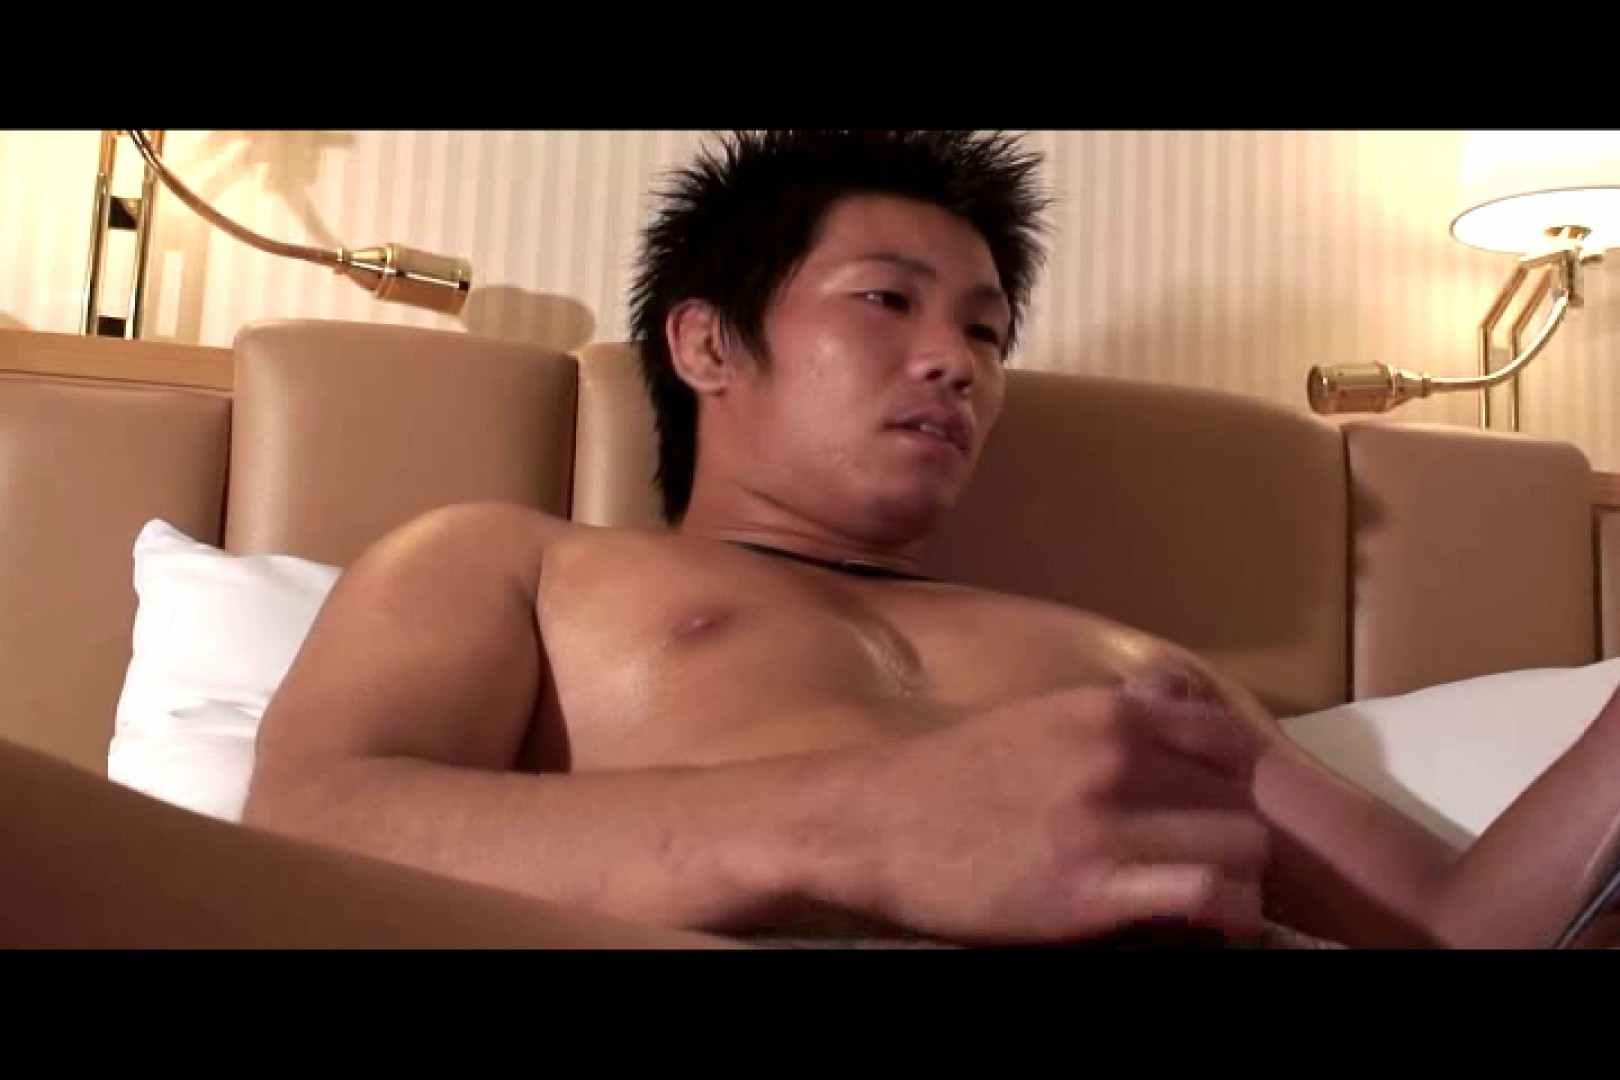 Bistro「イケメン」~Mokkori和風仕立て~vol.03 オナニー専門男子 ゲイ丸見え画像 67画像 14